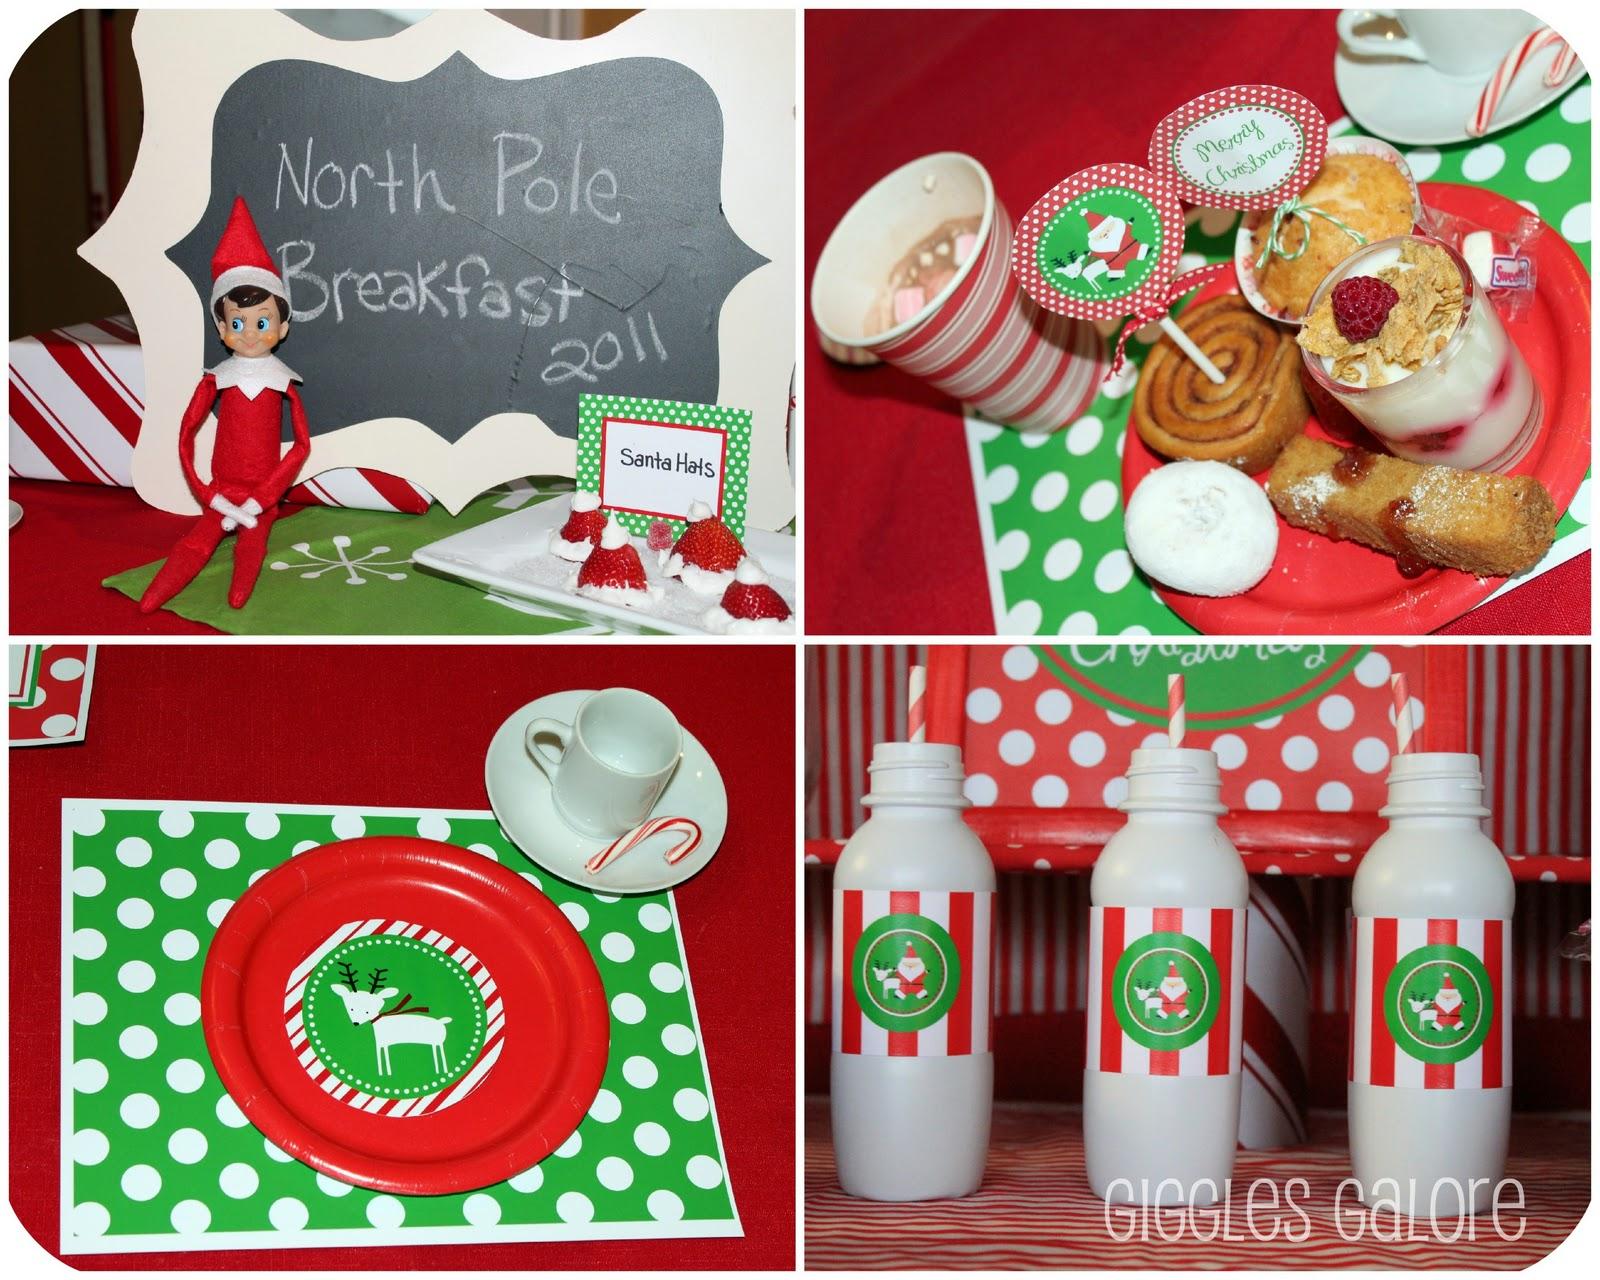 North Pole Breakfast 2011